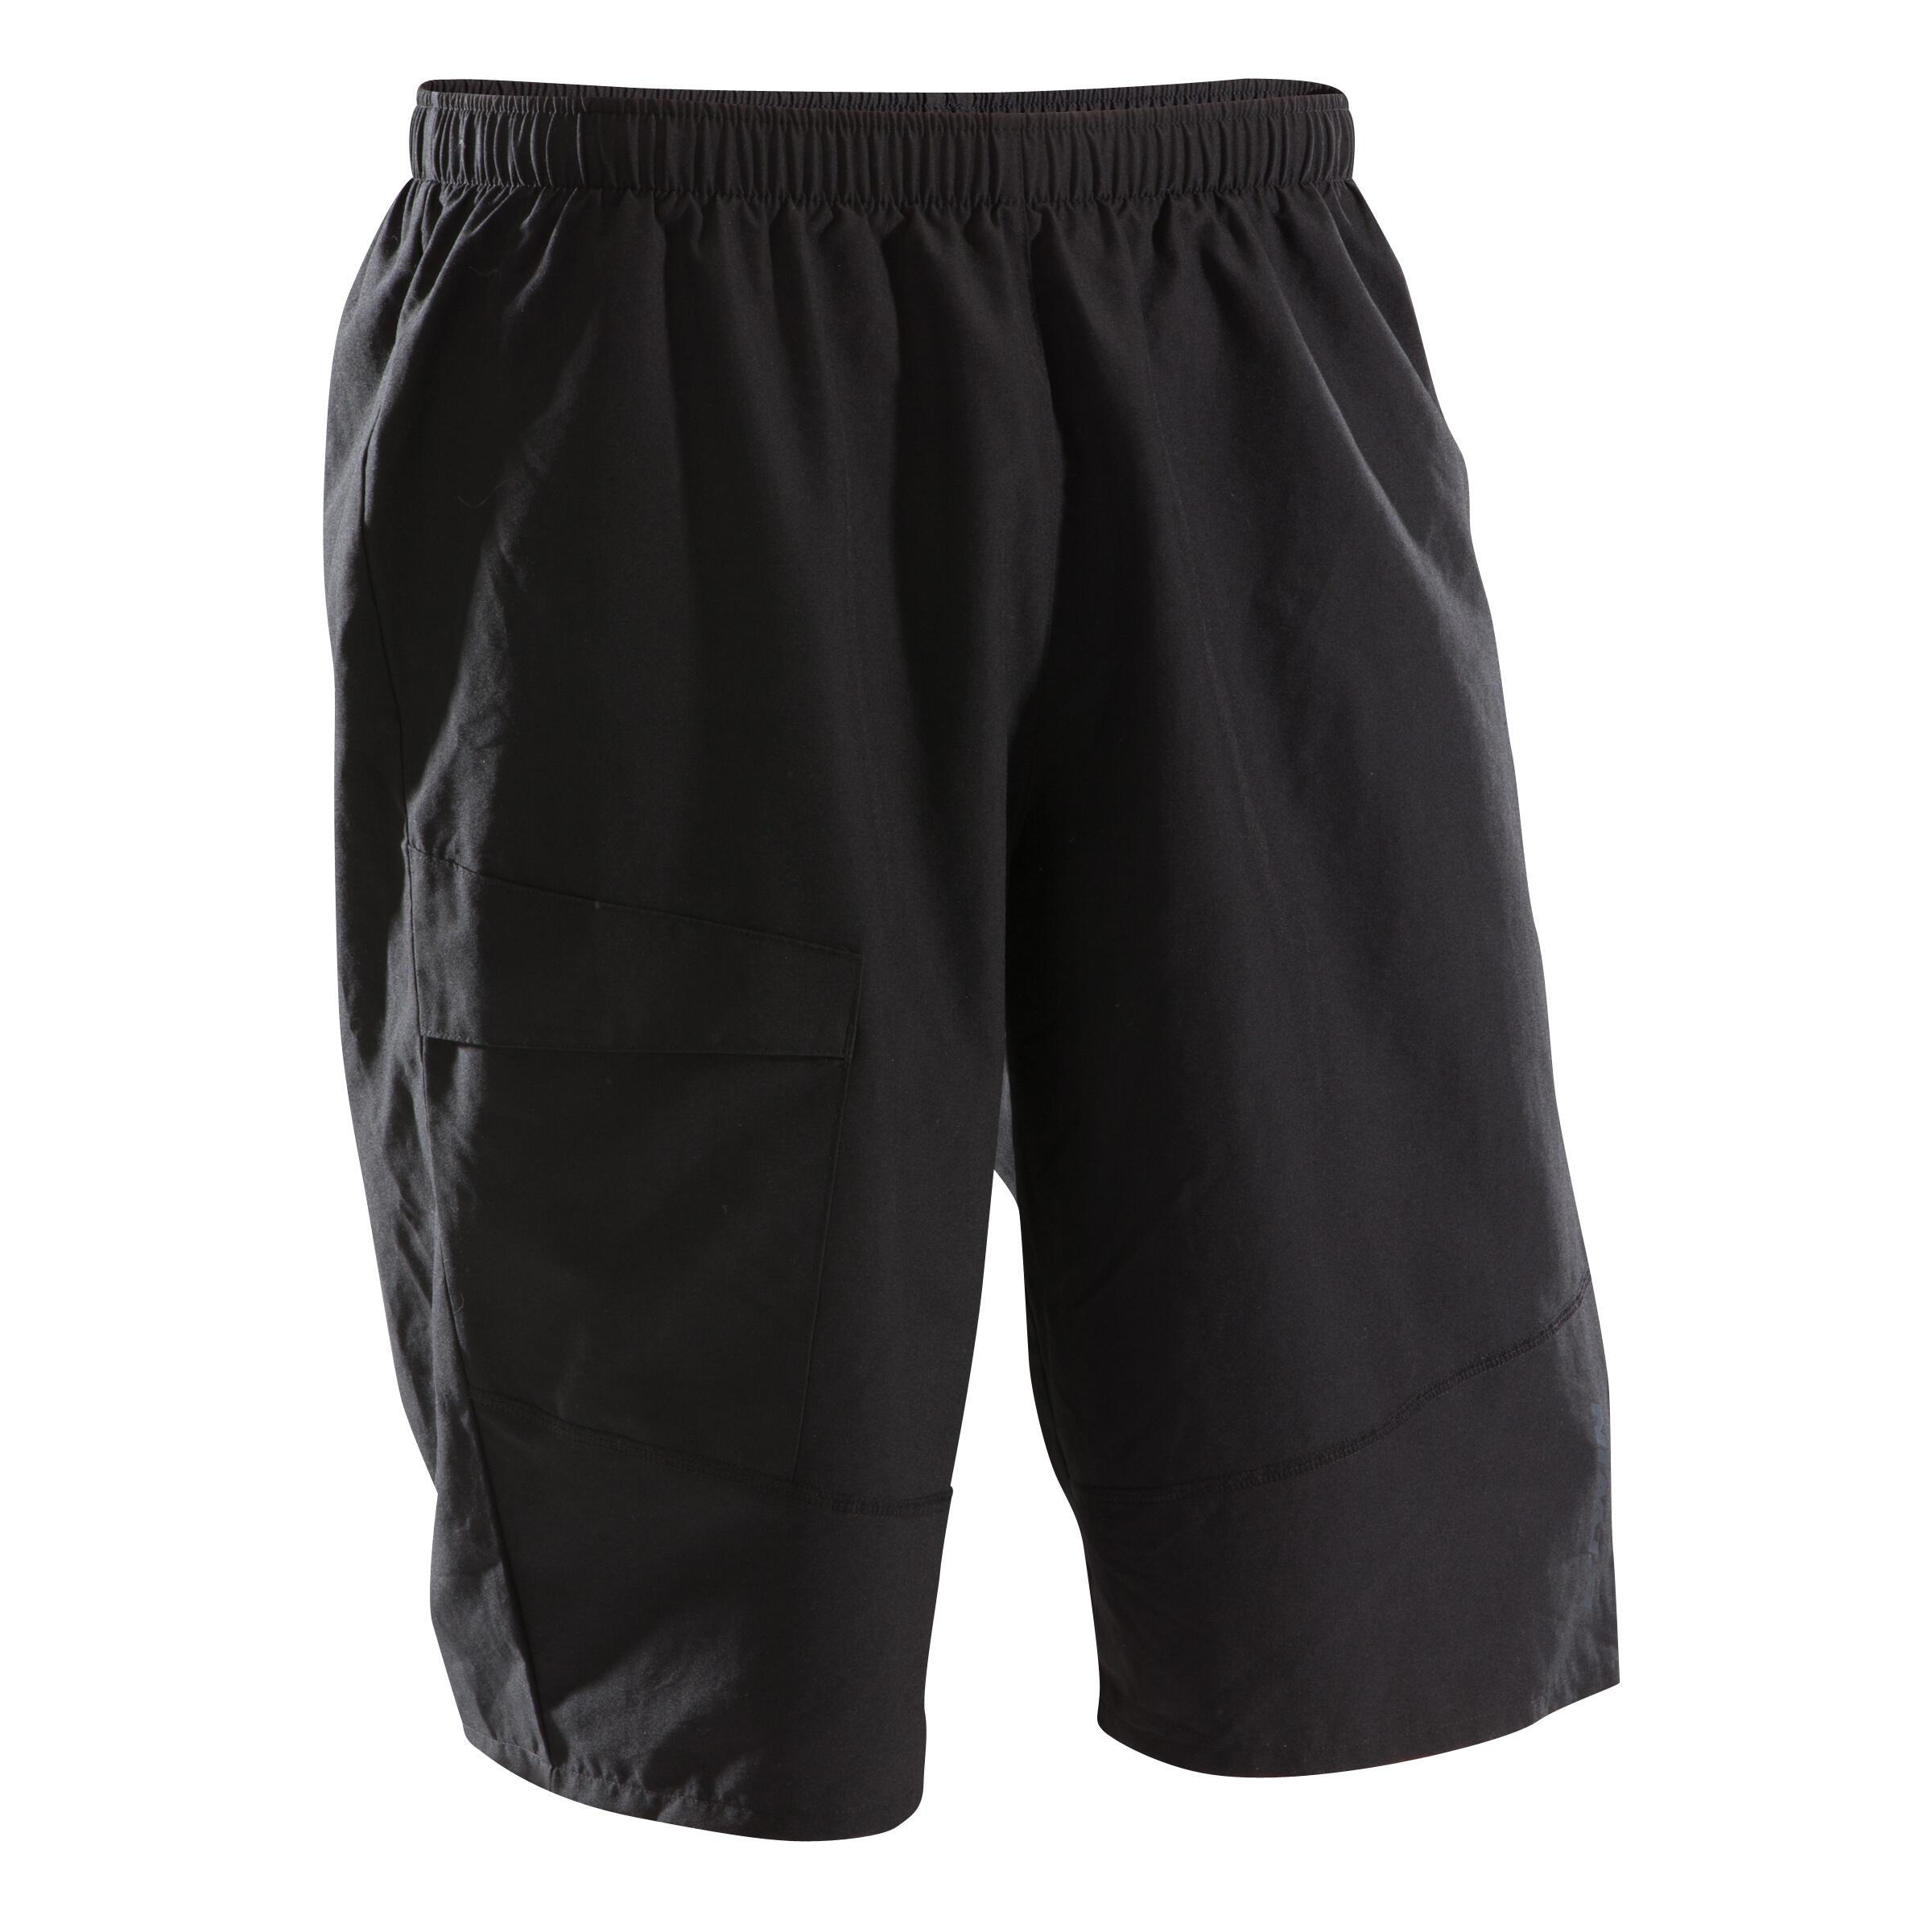 100 Mountain Bike Shorts - Black